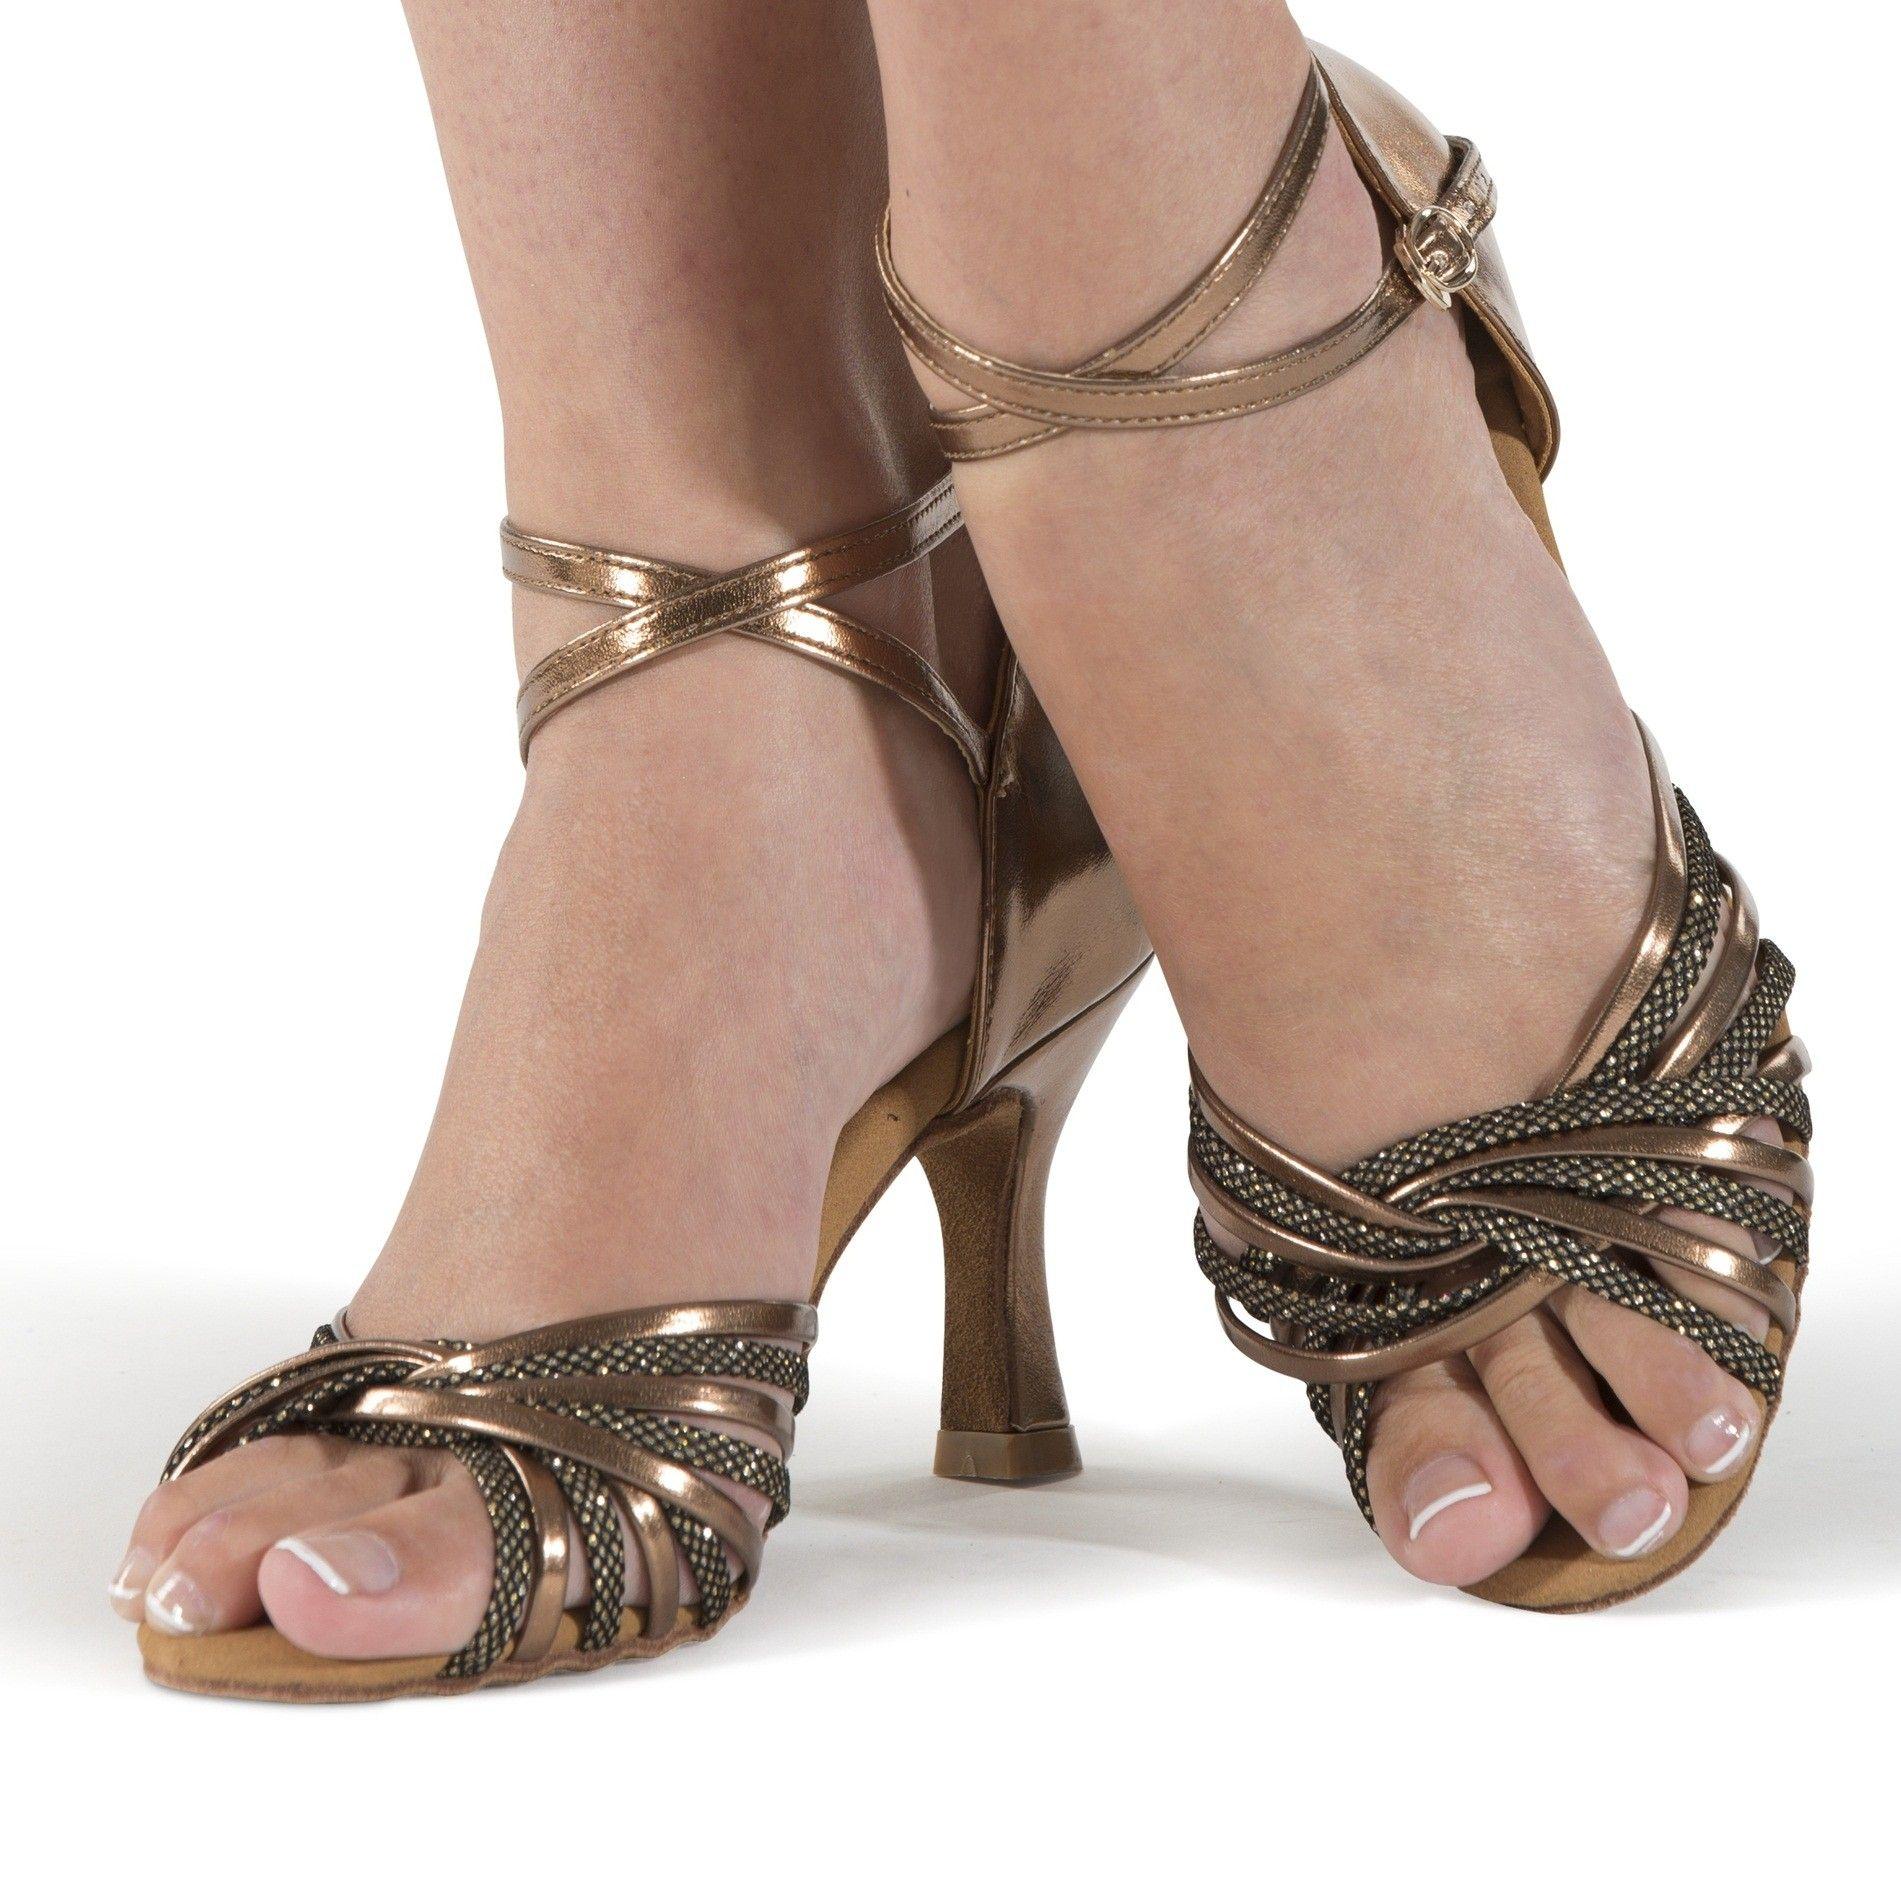 sandalia cor cobre - Pesquisa Google